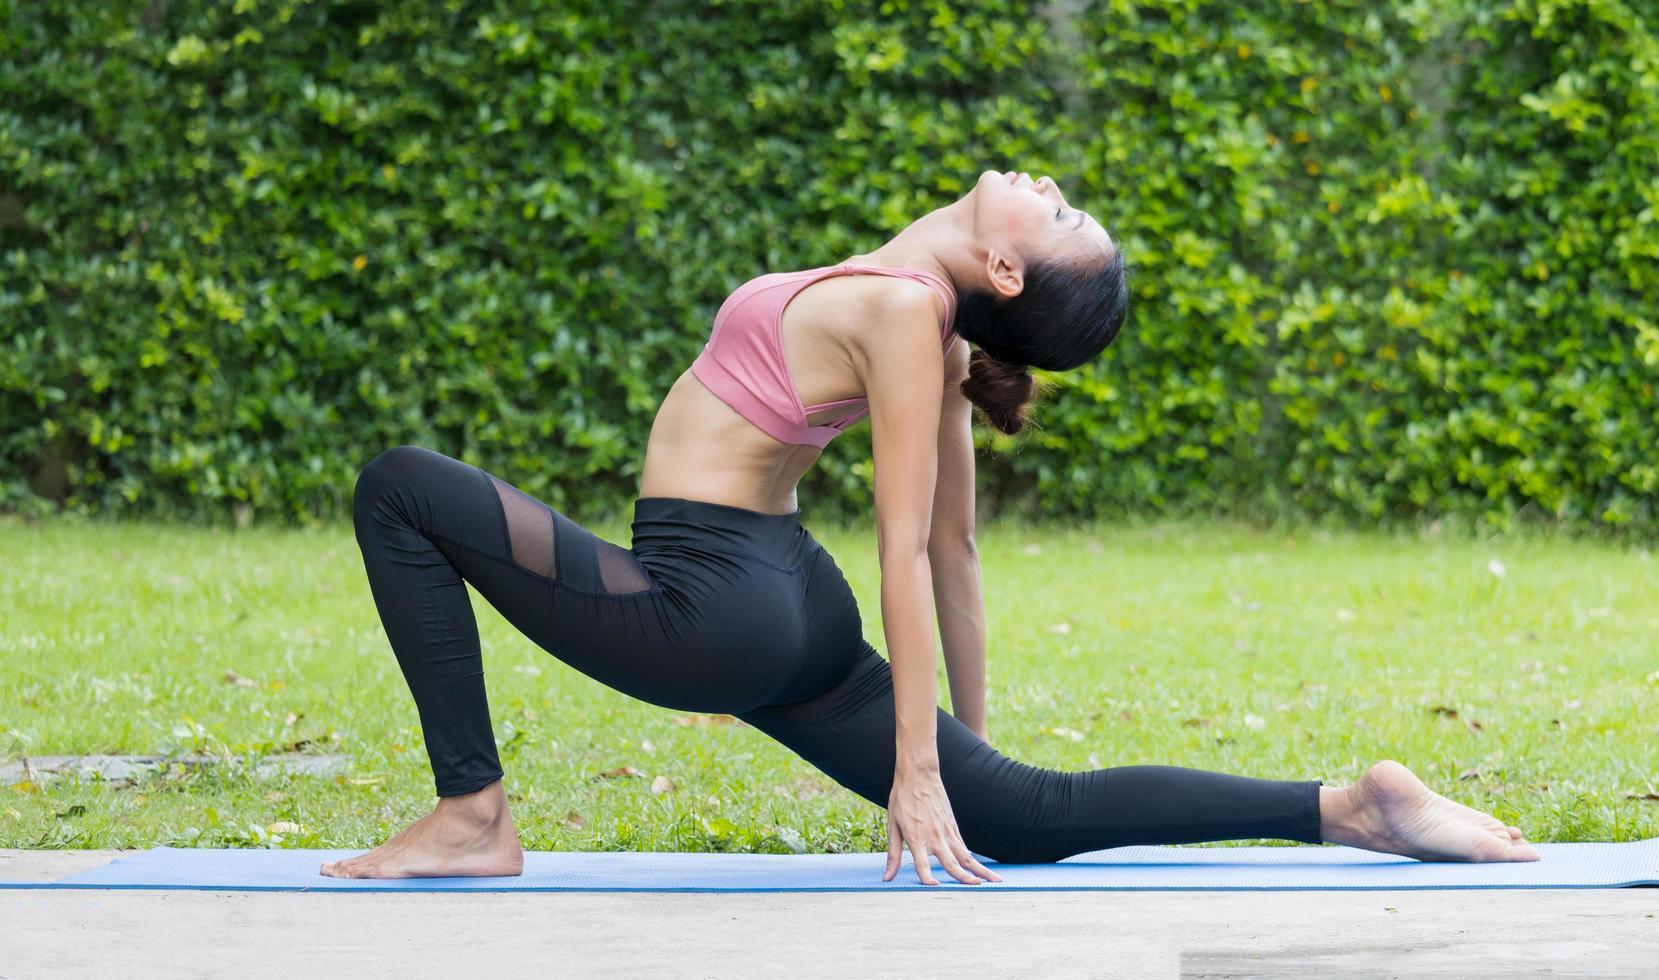 asiatische Frau macht Yoga foto